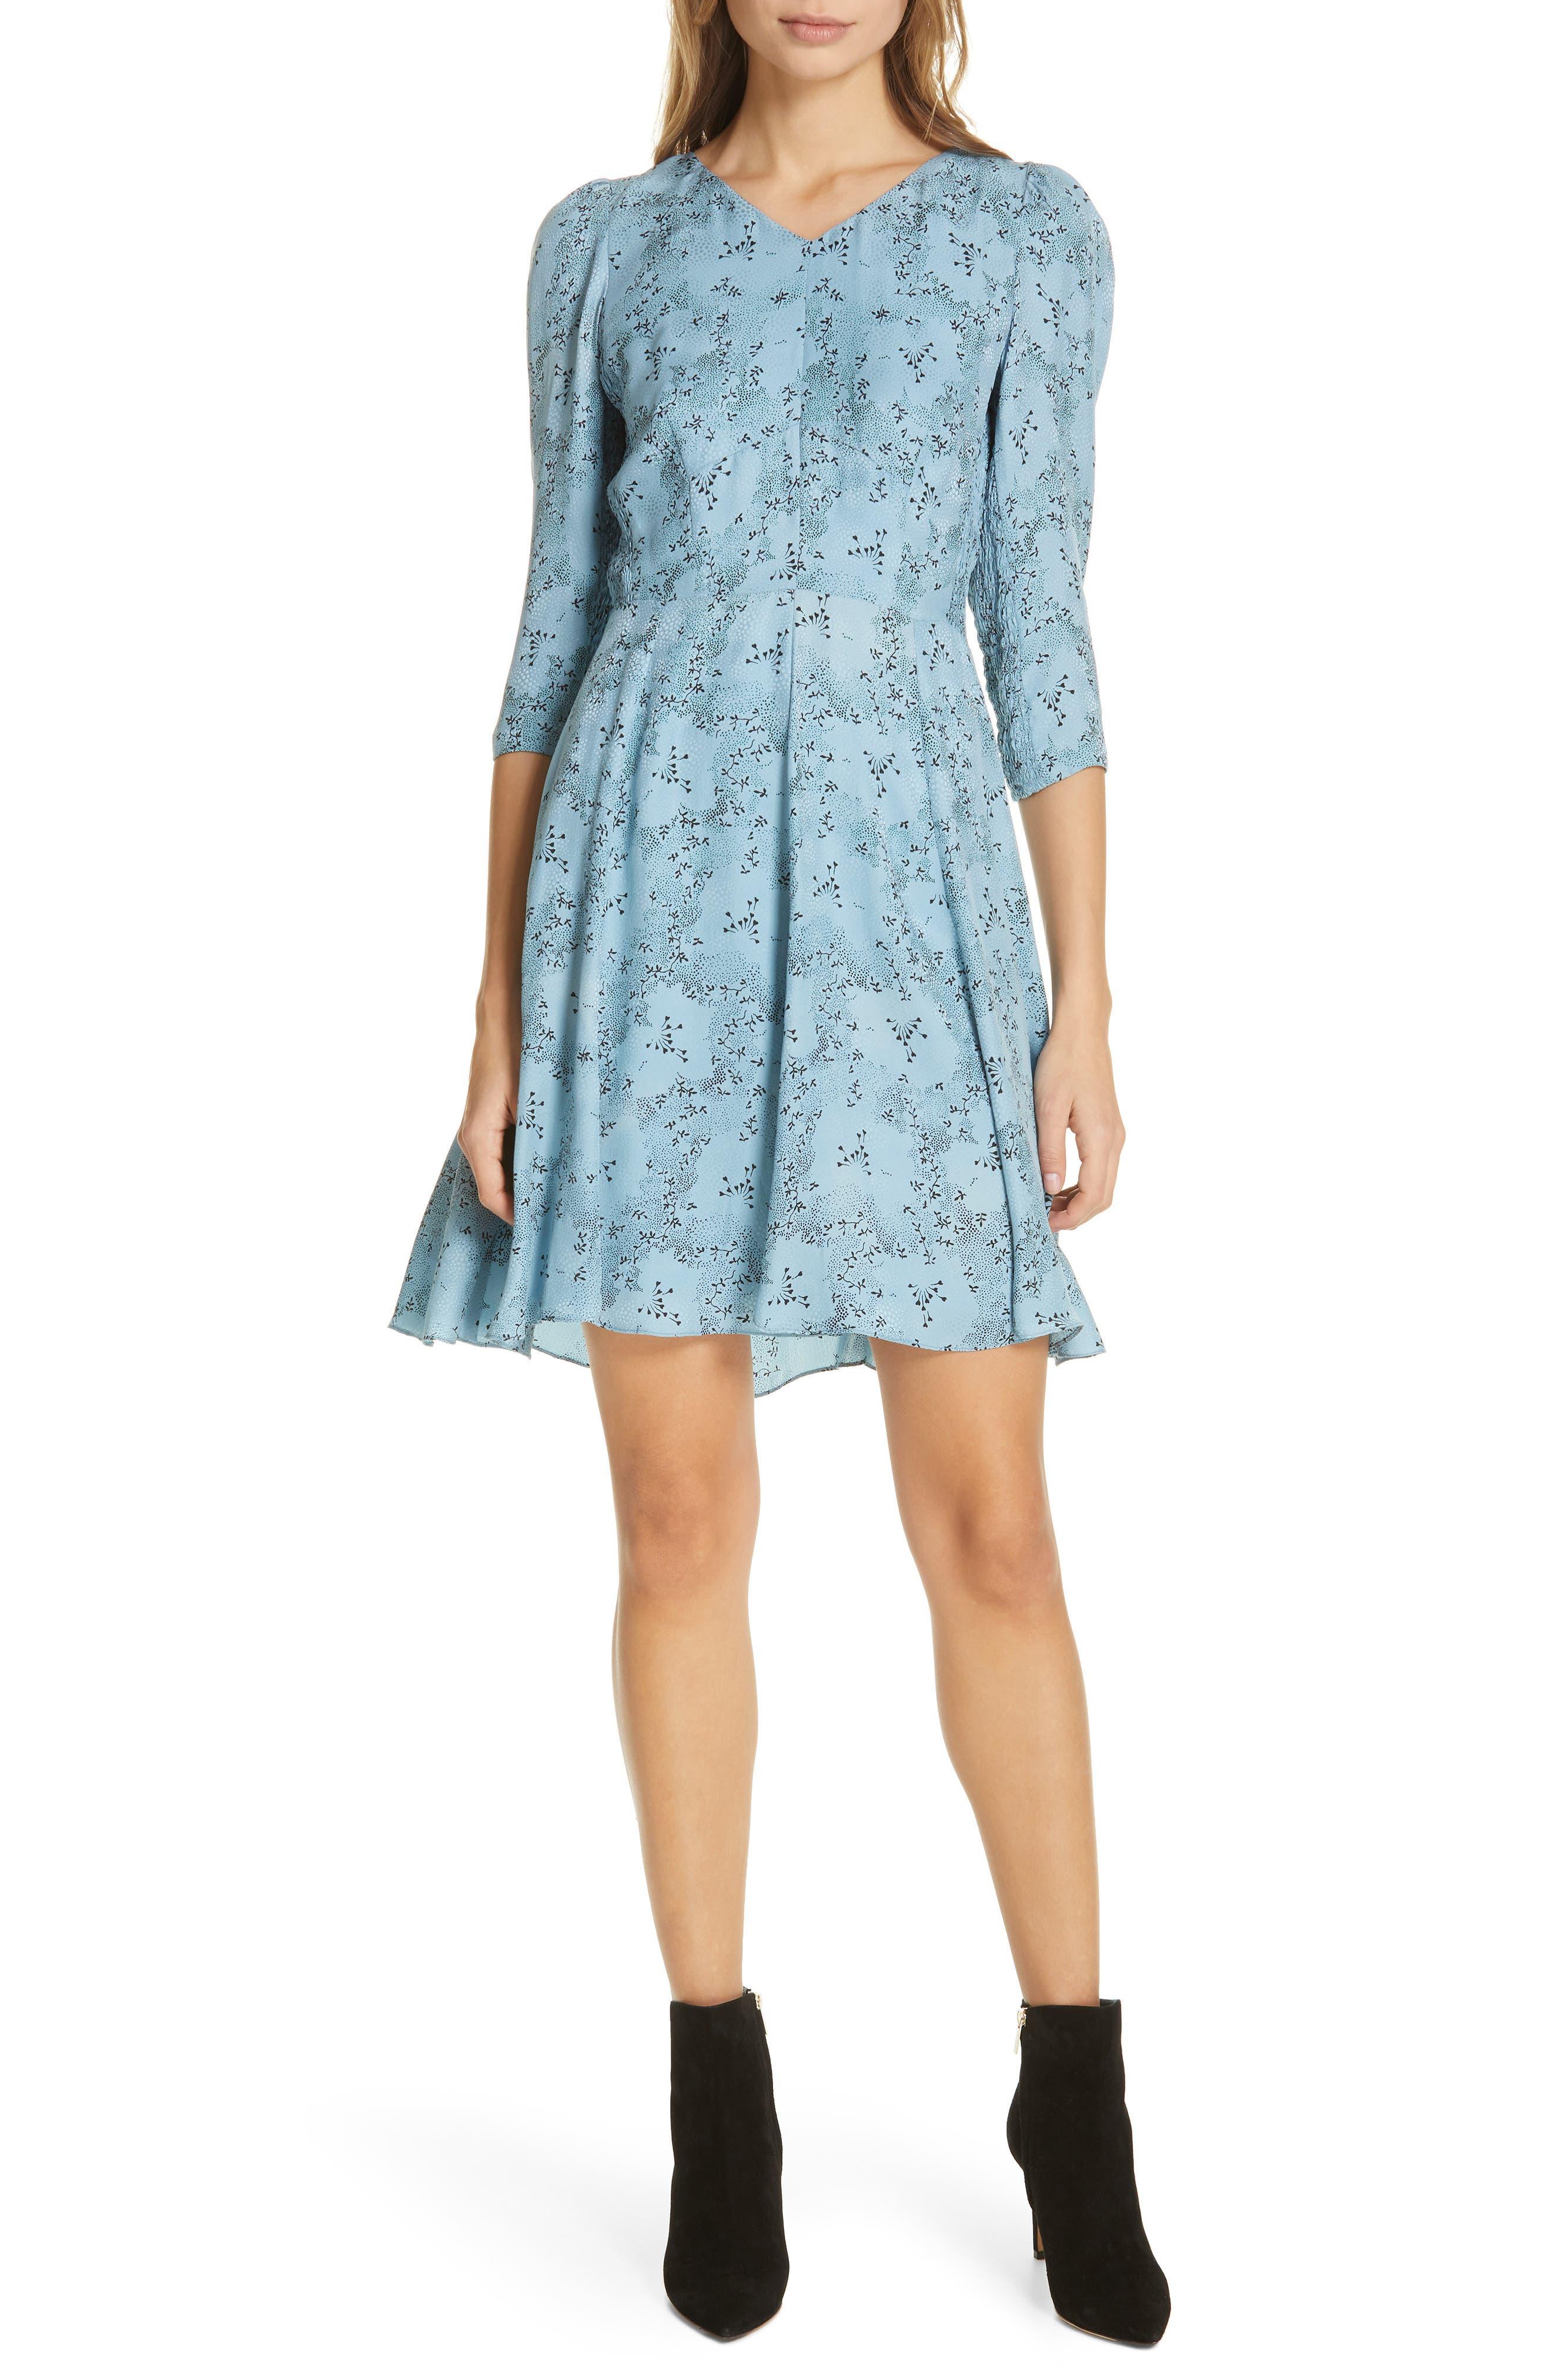 REBECCA TAYLOR Gianna Floral Silk Dress, Main, color, LAGOON COMBO